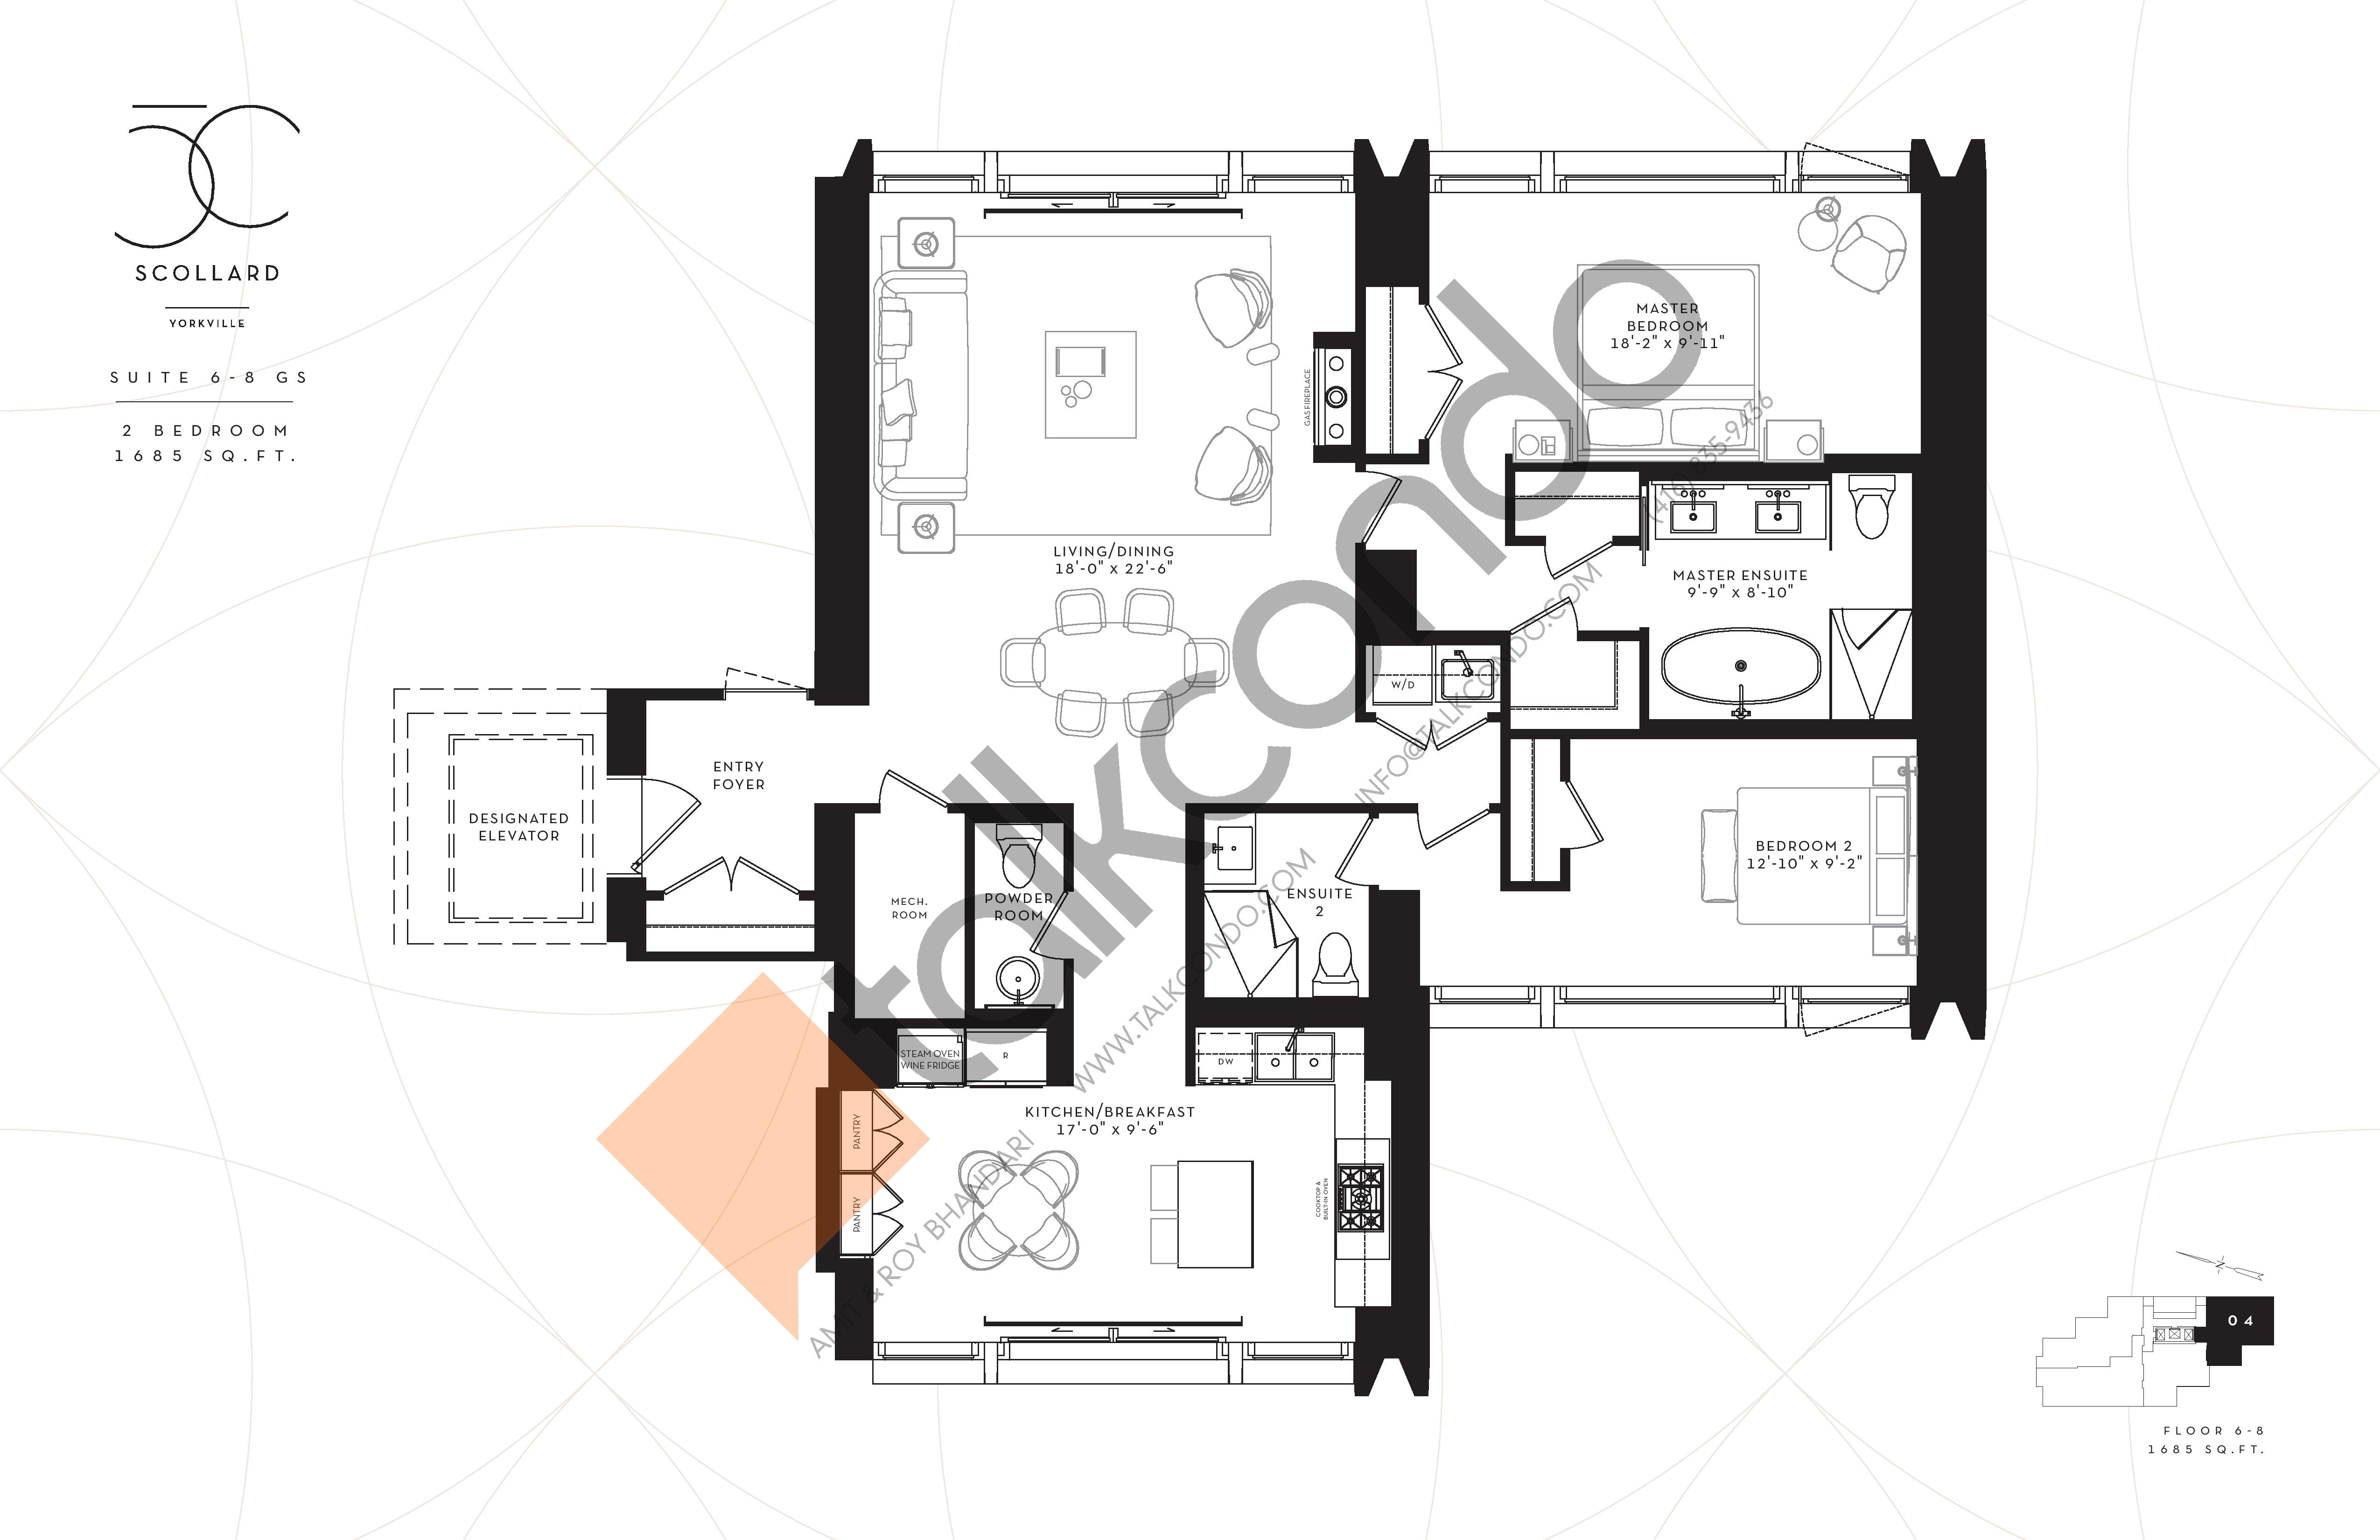 Suite 6-8 GS Floor Plan at Fifty Scollard Condos - 1685 sq.ft